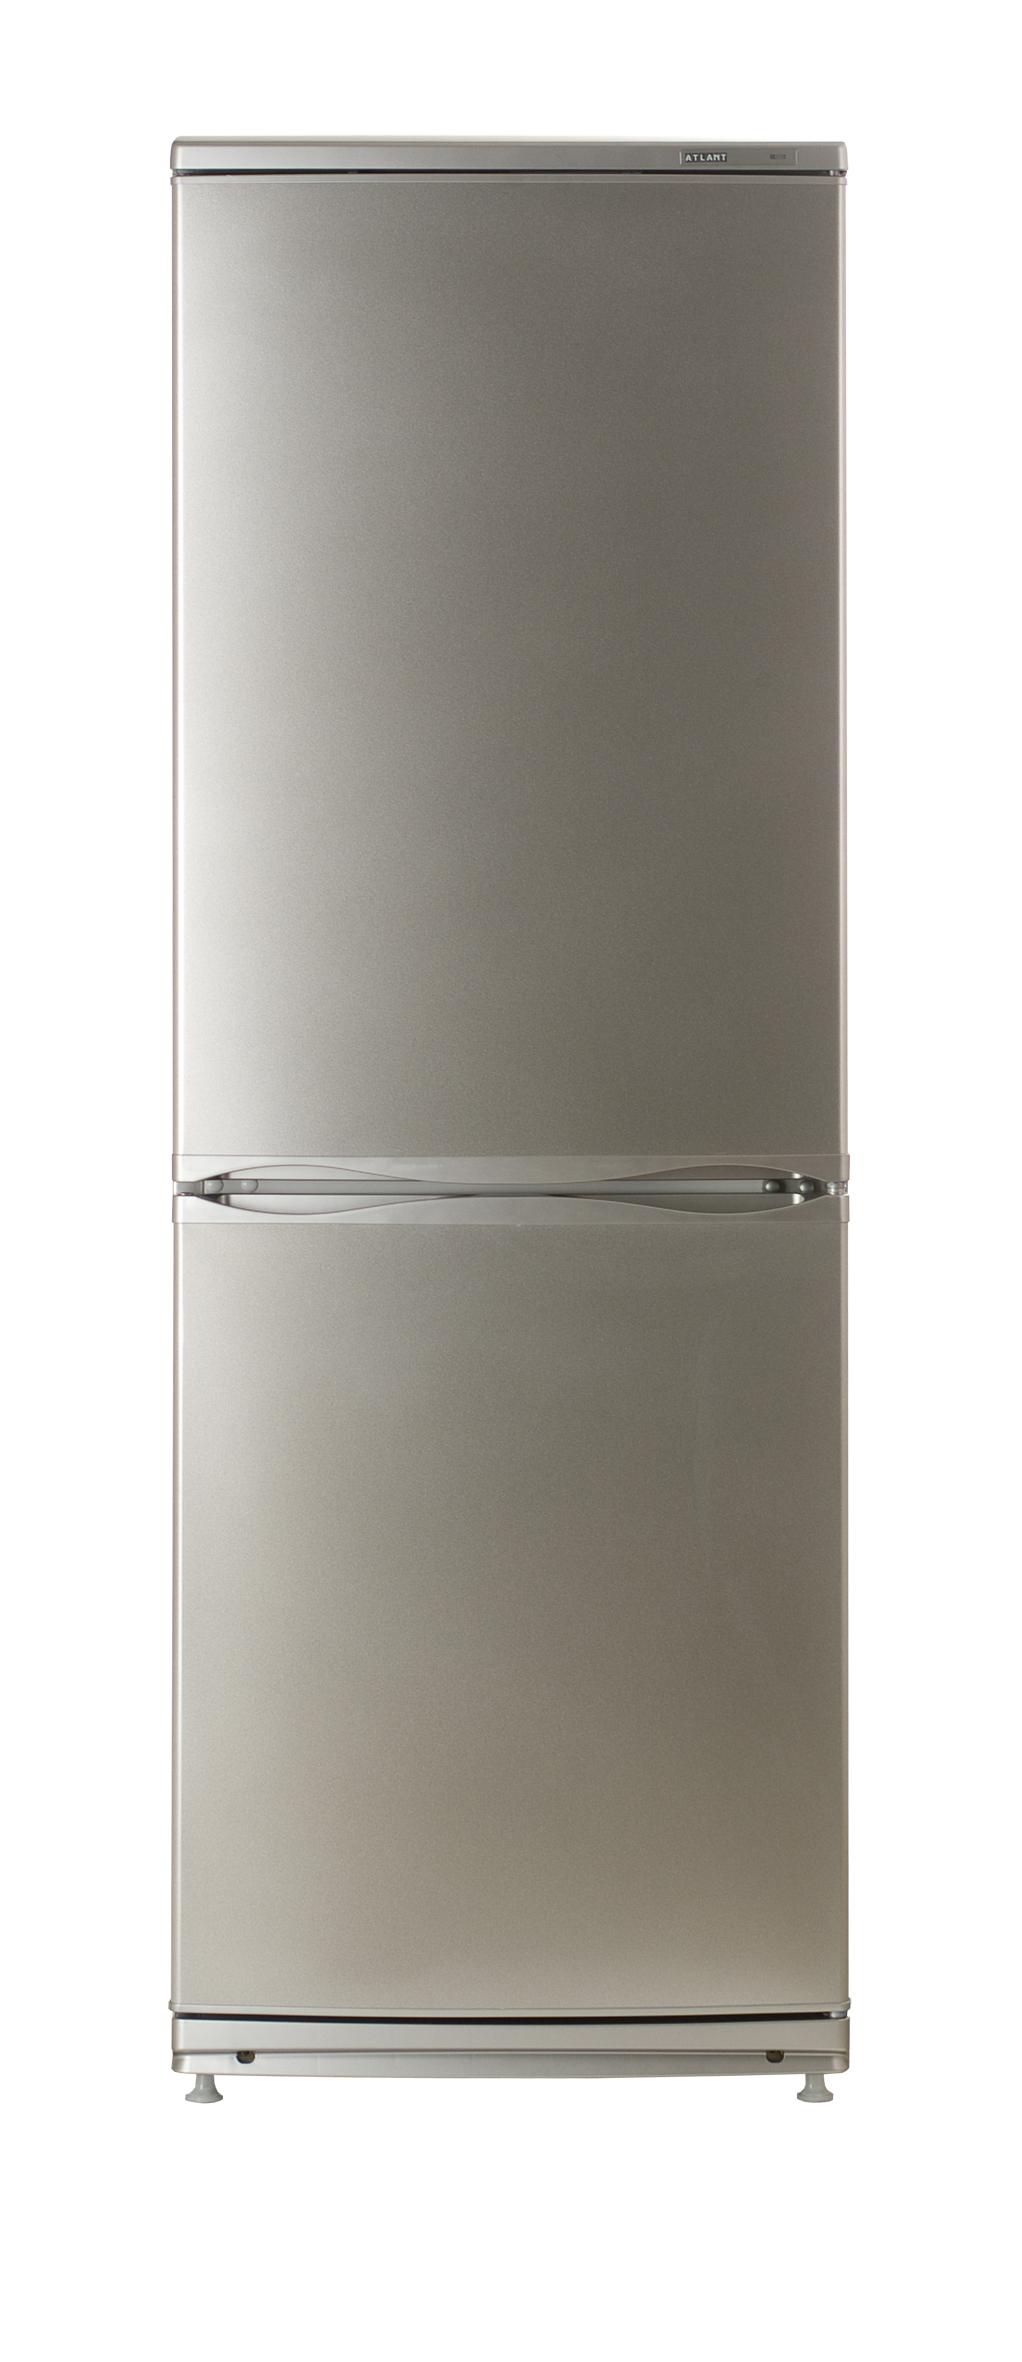 Холодильник Атлант Real Brand Technics 16259.000